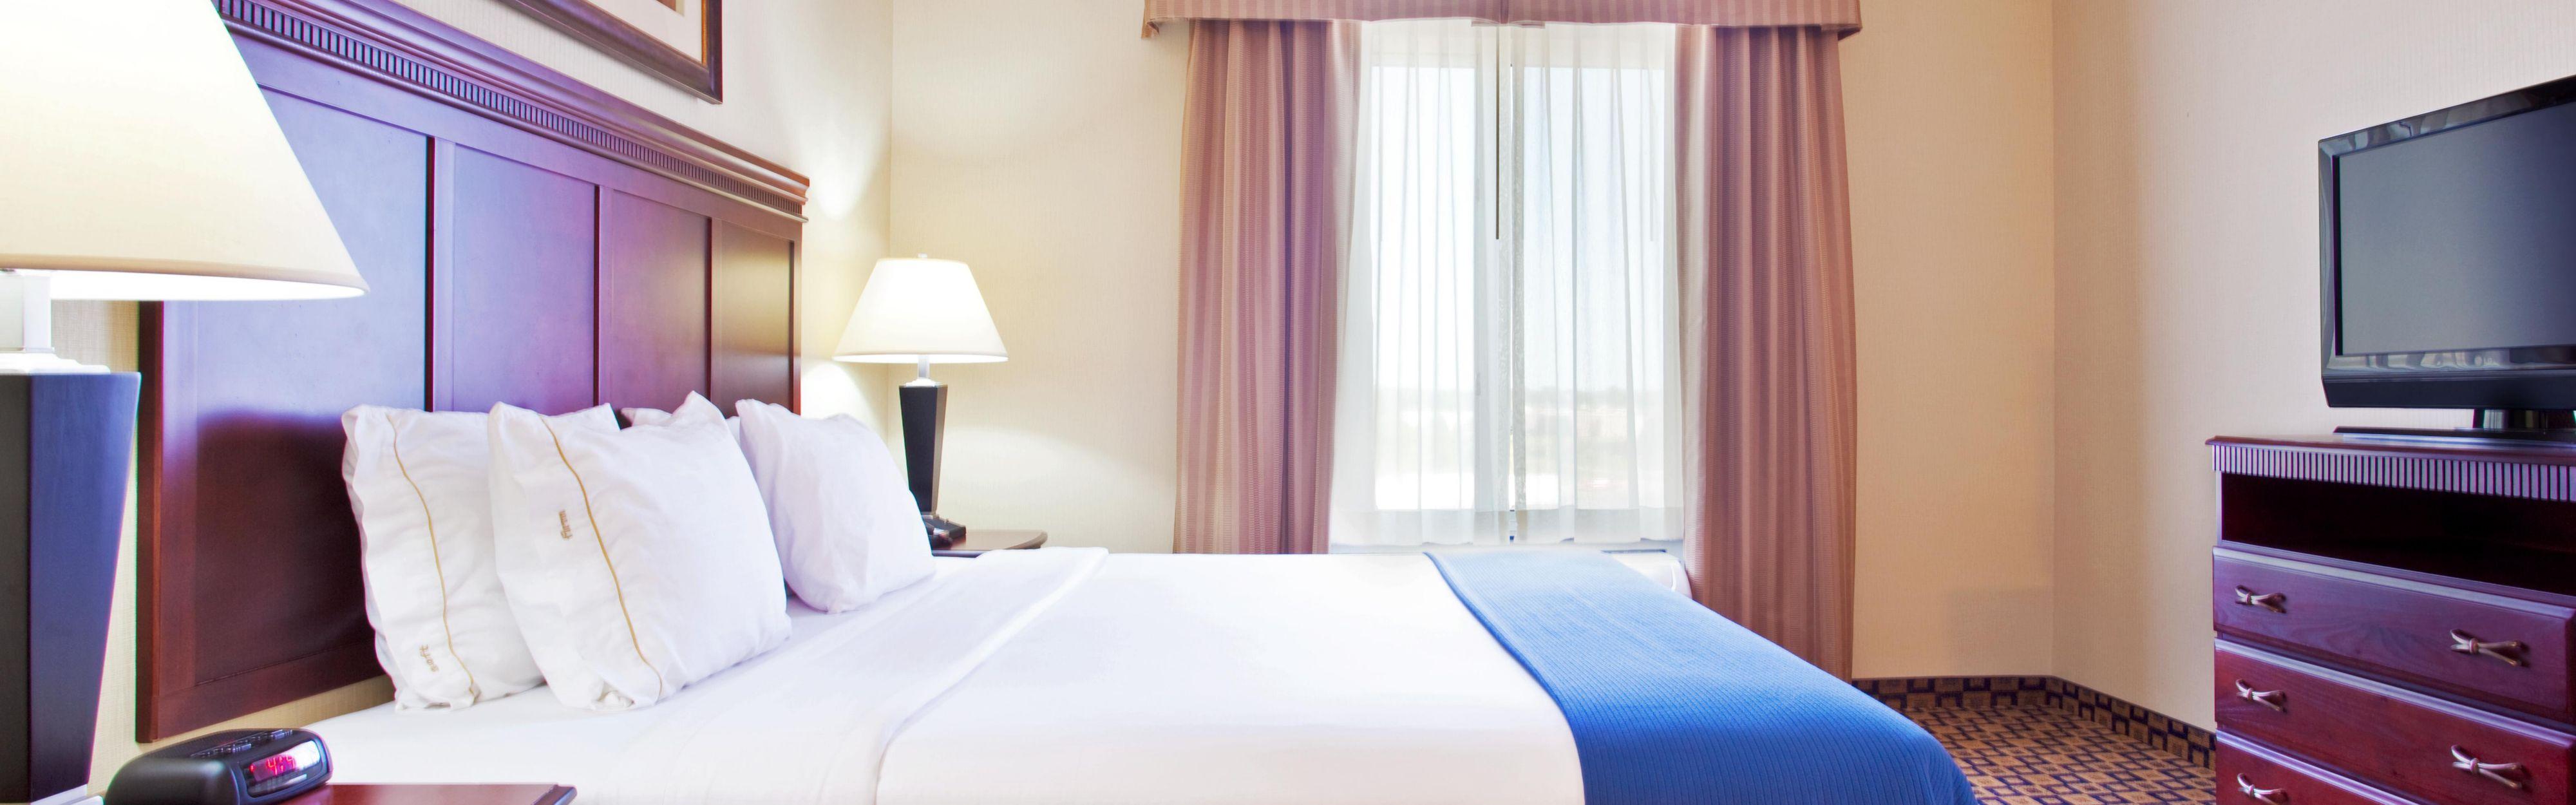 Holiday Inn Express & Suites Chicago North-Waukegan-Gurnee image 1